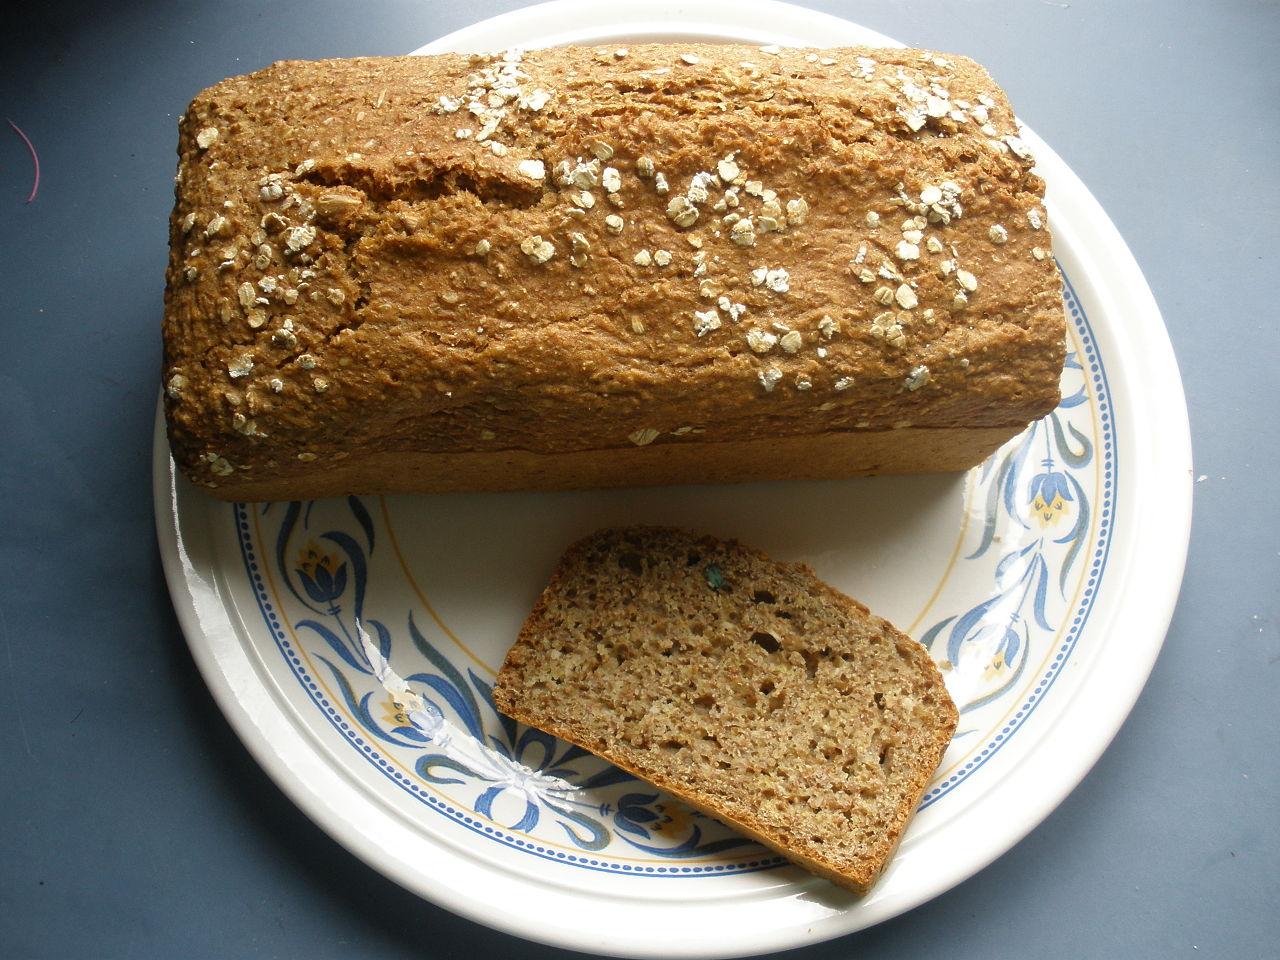 File:Irish brown soda bread.JPG - Wikimedia Commons